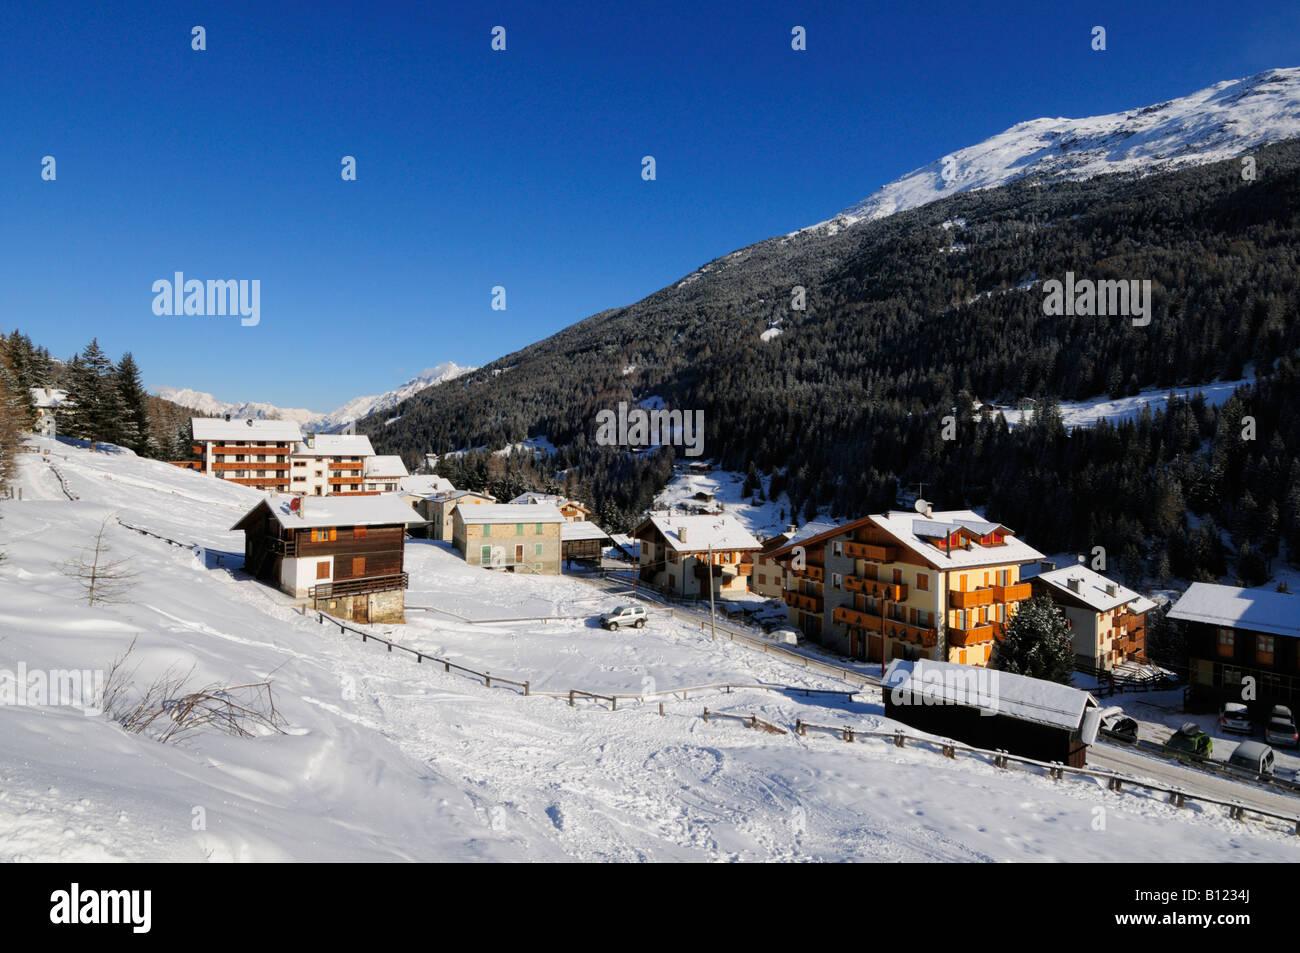 st caterina ski resort italy europe stock photo: 17871410 - alamy